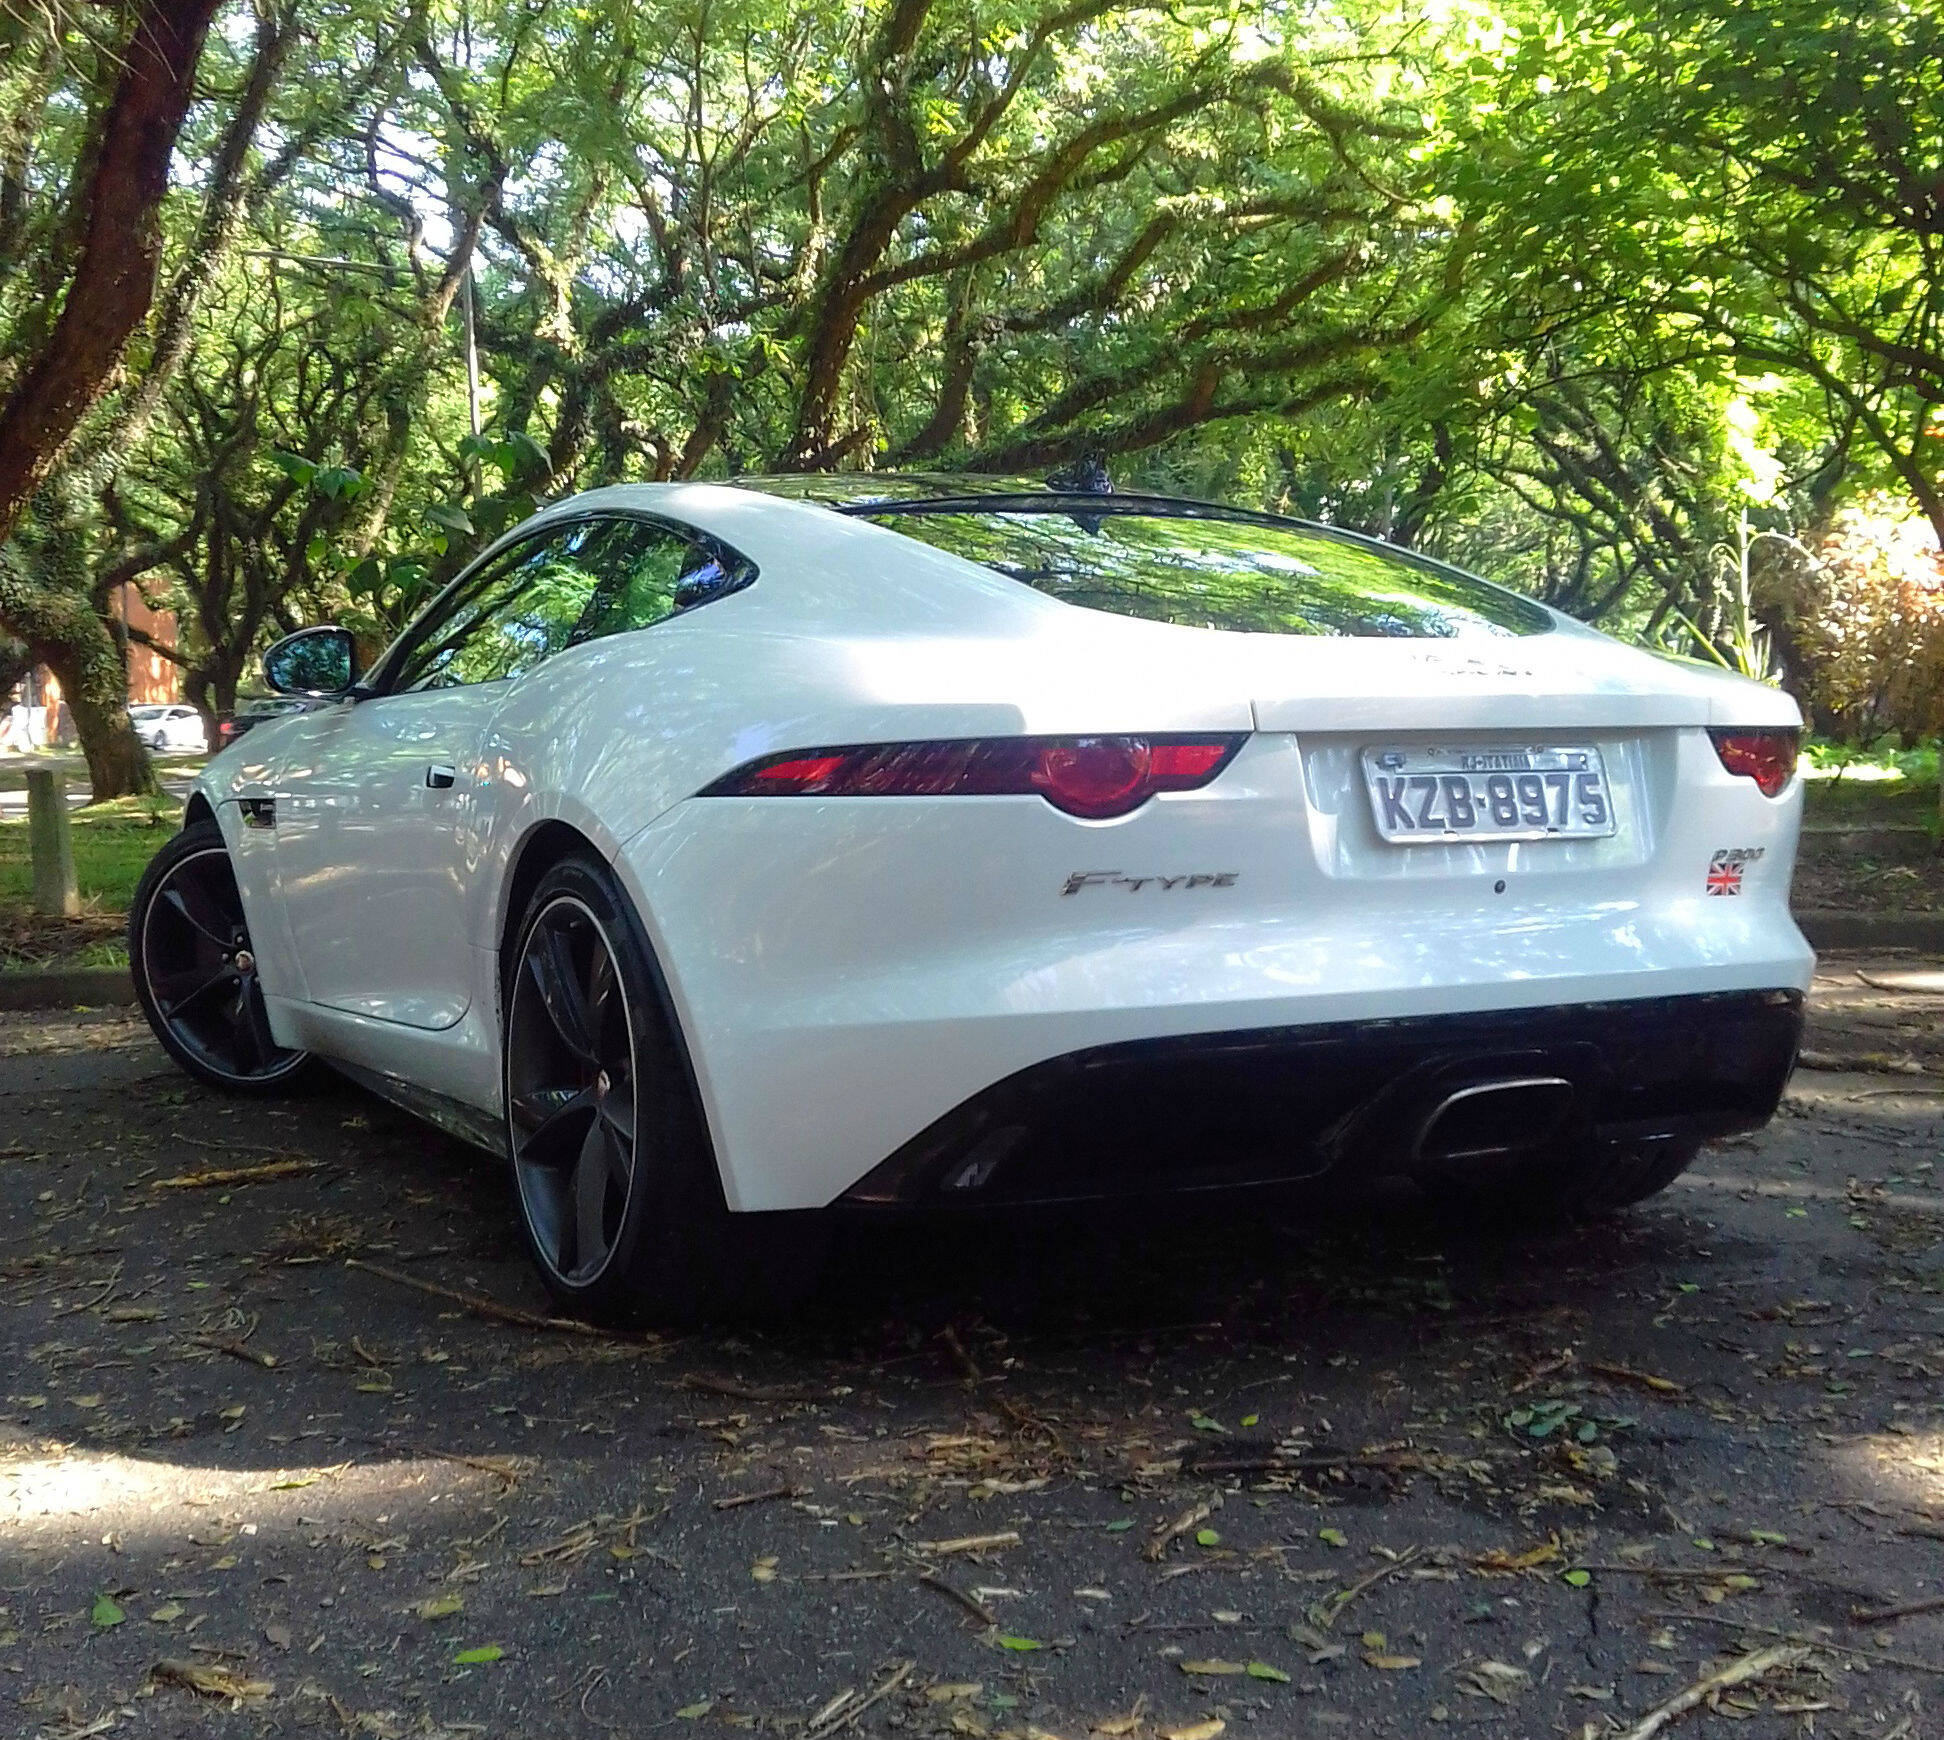 Jaguar F-Type 2.0. Foto: Carlos Guimarães/iG